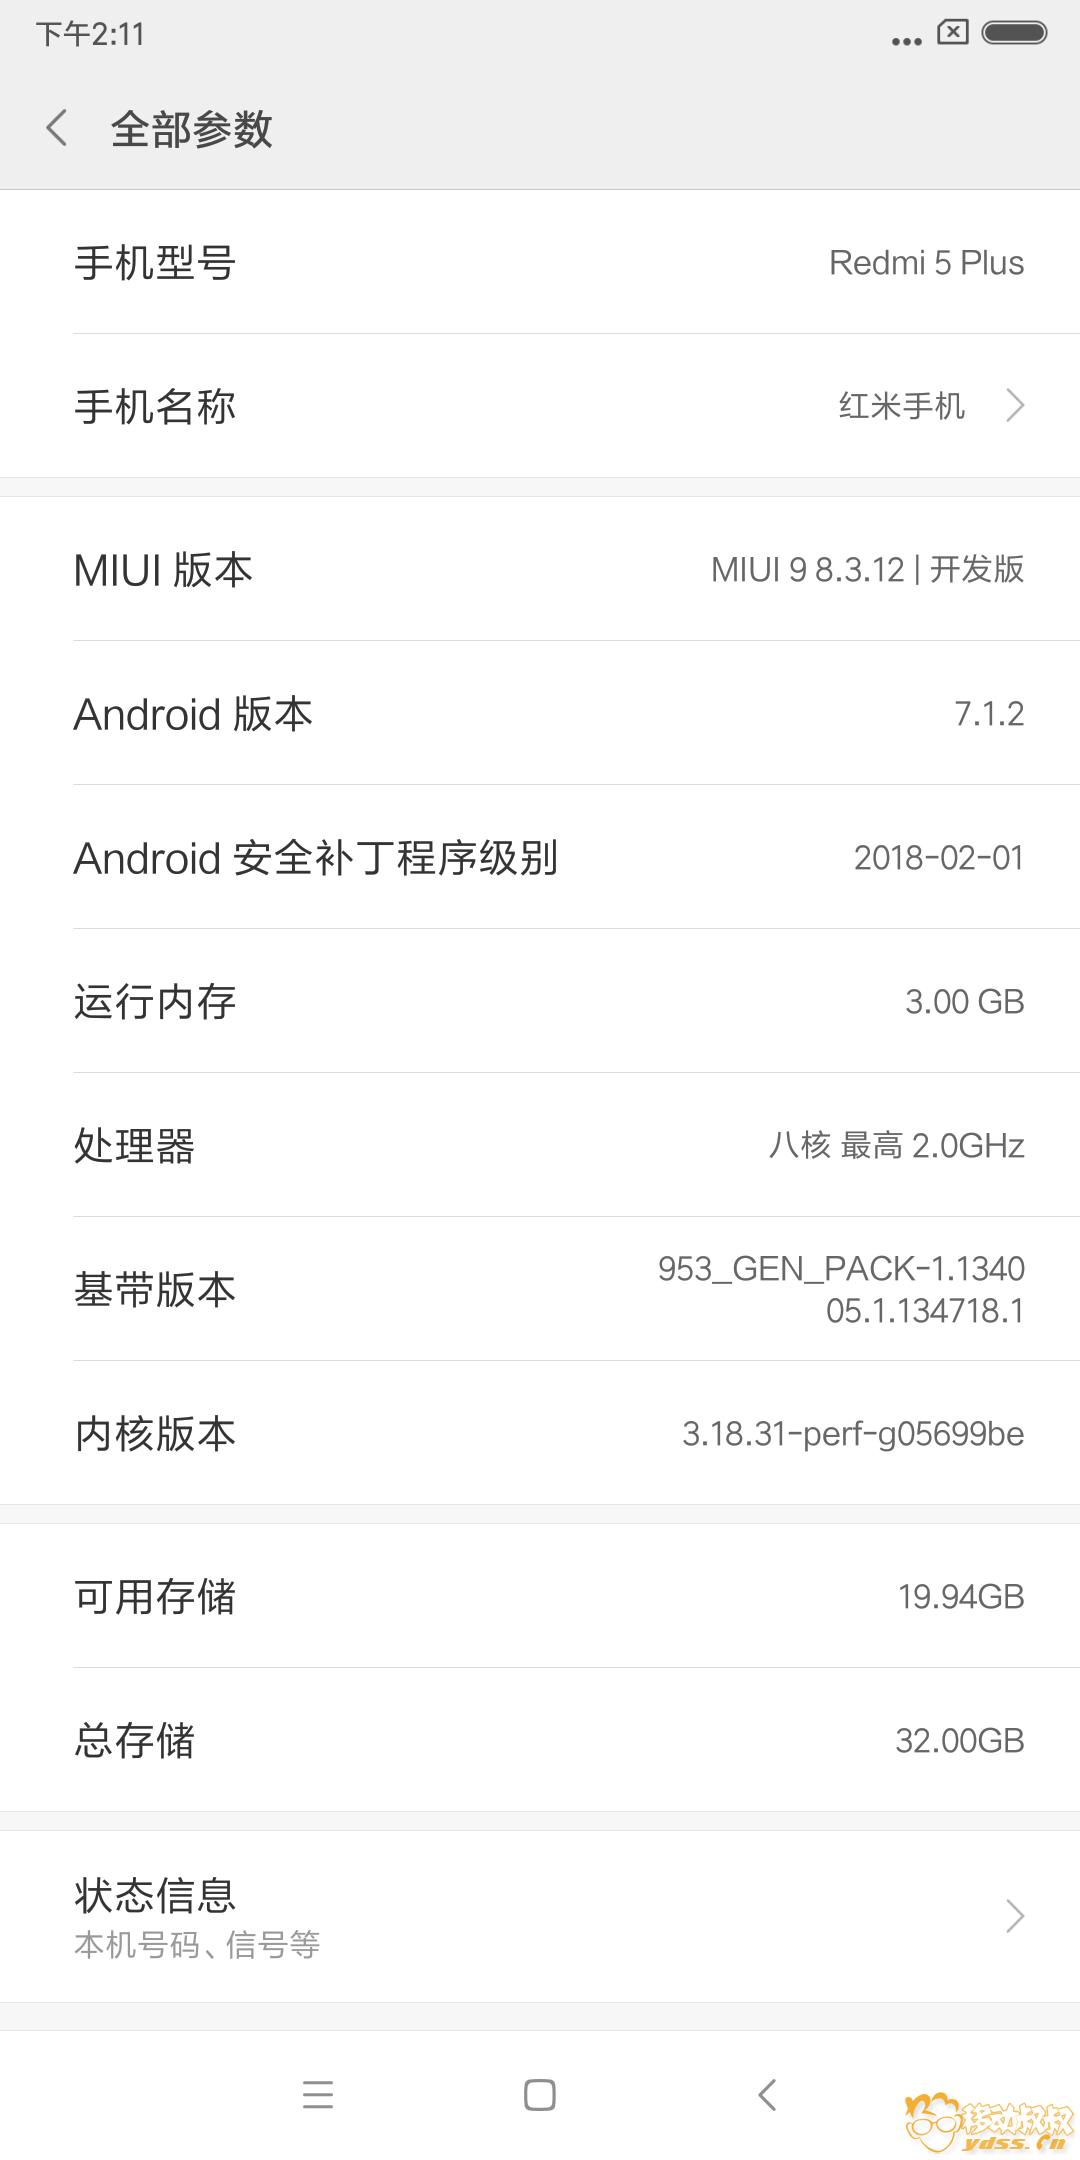 Screenshot_2018-03-12-14-11-37-956_com.android.settings.png